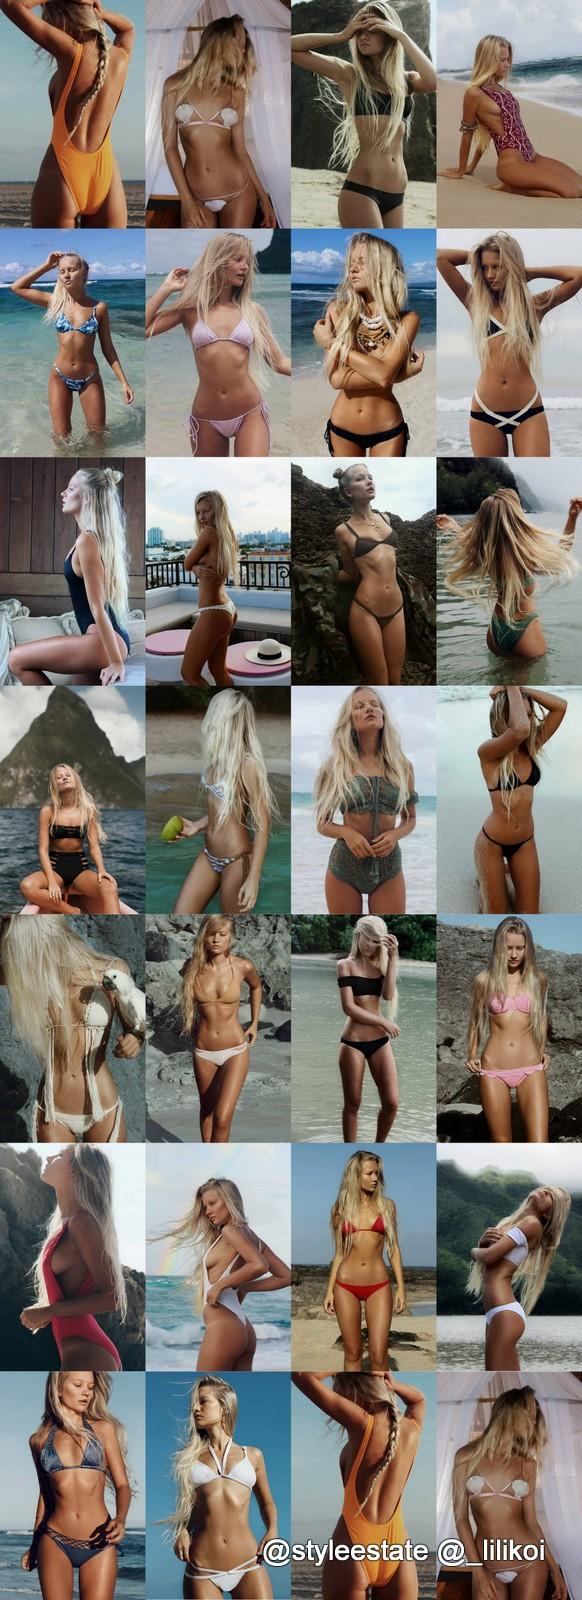 IG Model @_lilikoi's Top 26 Bikinis & Swimsuits 2016